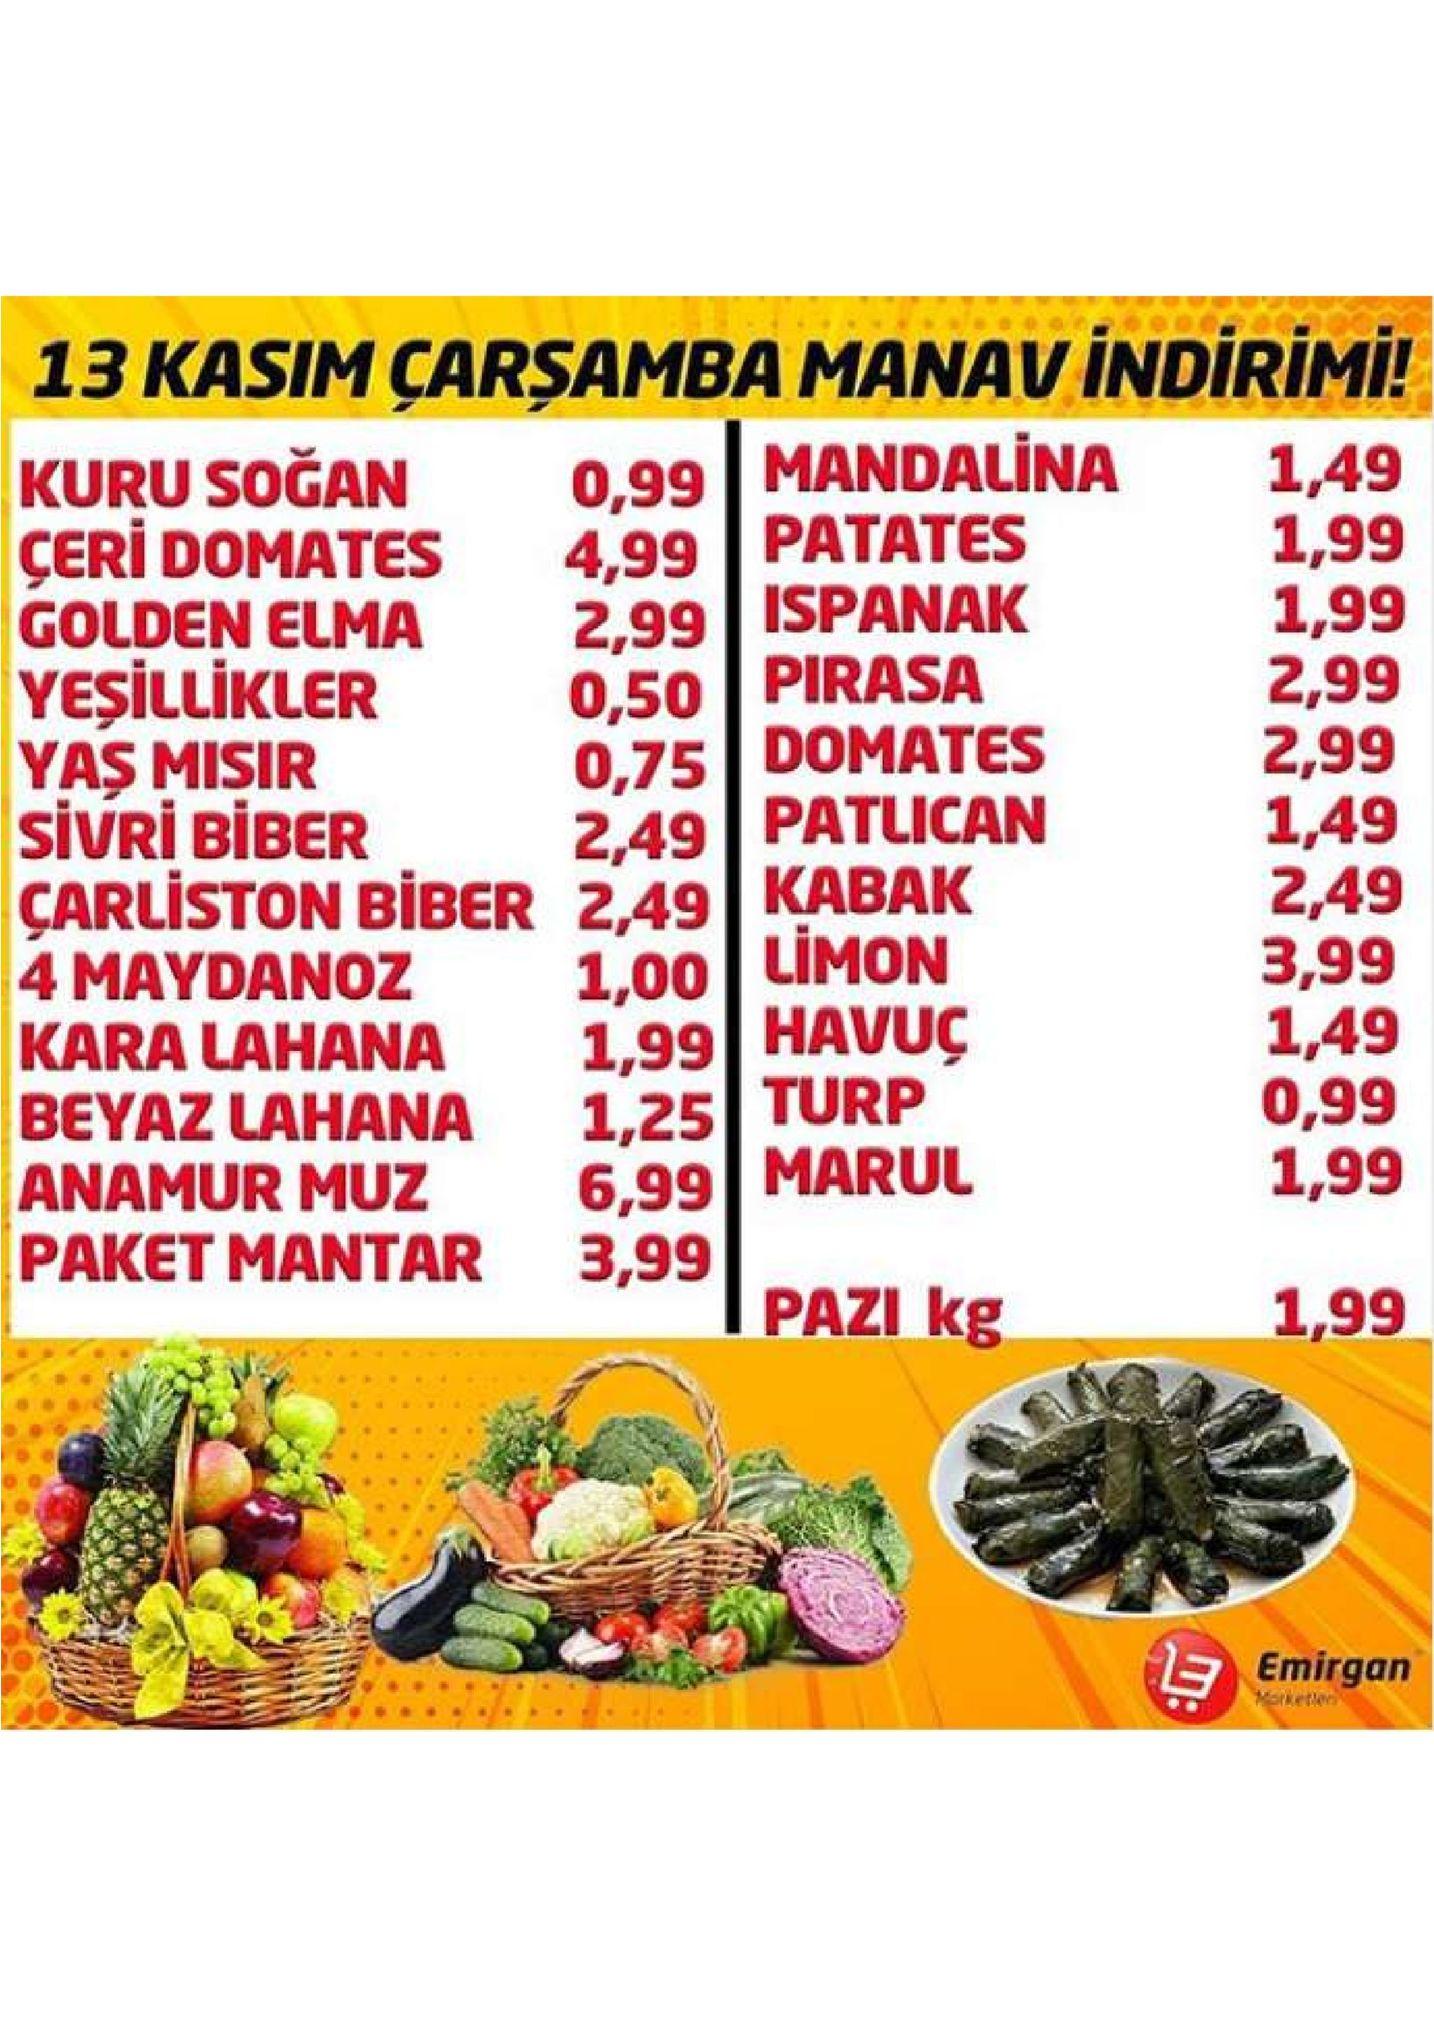 13 kasim çarsamba manav indirimi! 0,99 mandalina 4,99 patates 2,99 ispanak 0,50 pirasa 0,75 domates 2,49 patlican kabak limon 1,49 1,99 1,99 2,99 2,99 1,49 2,49 3,99 1,49 0,99 1,99 kuru soğan çeri domates golden elma yeşillikler yas misir sivri biber çarliston biber 2,49 4 maydanoz kara lahana beyaz lahana anamur muz paket mantar 3,99 1,00 1,99 havuç 1,25 turp 6,99 marul pazi kg 1,99 emirgan